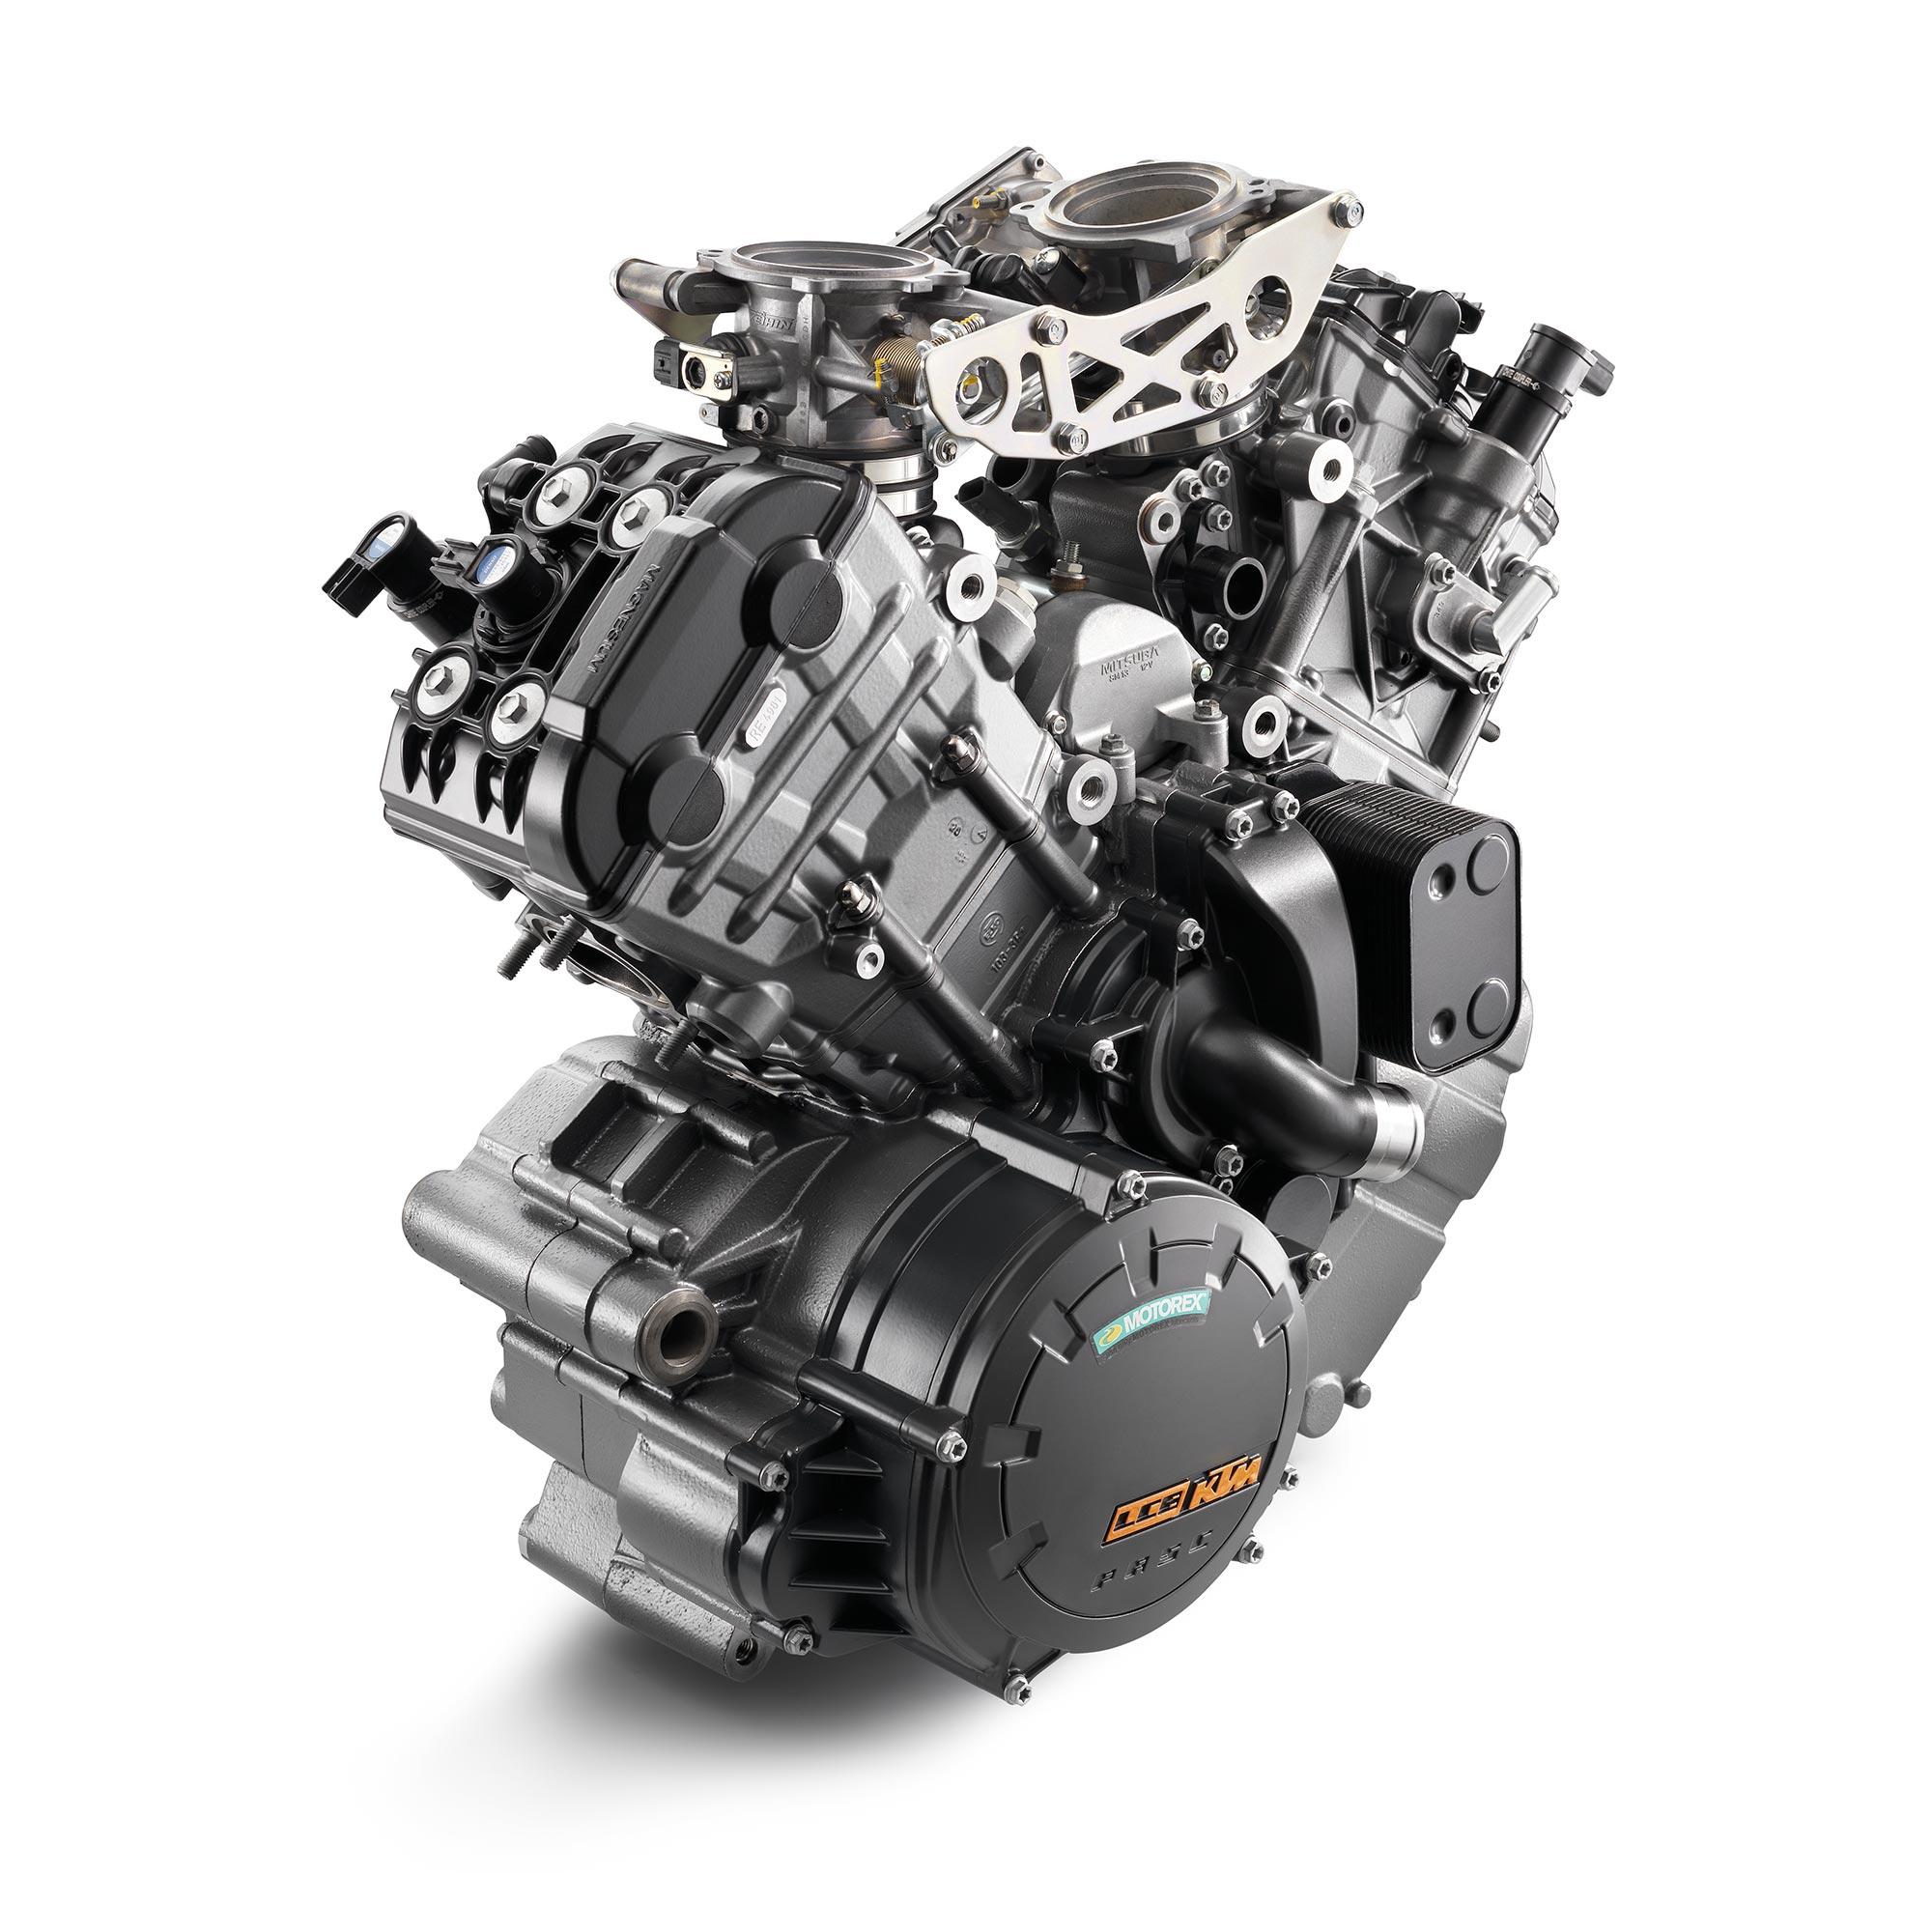 ktm ac wiring diagrams lc8 ktm motorcycle engine diagrams ktm considering 500cc & 800cc motorcycles in india ... #12